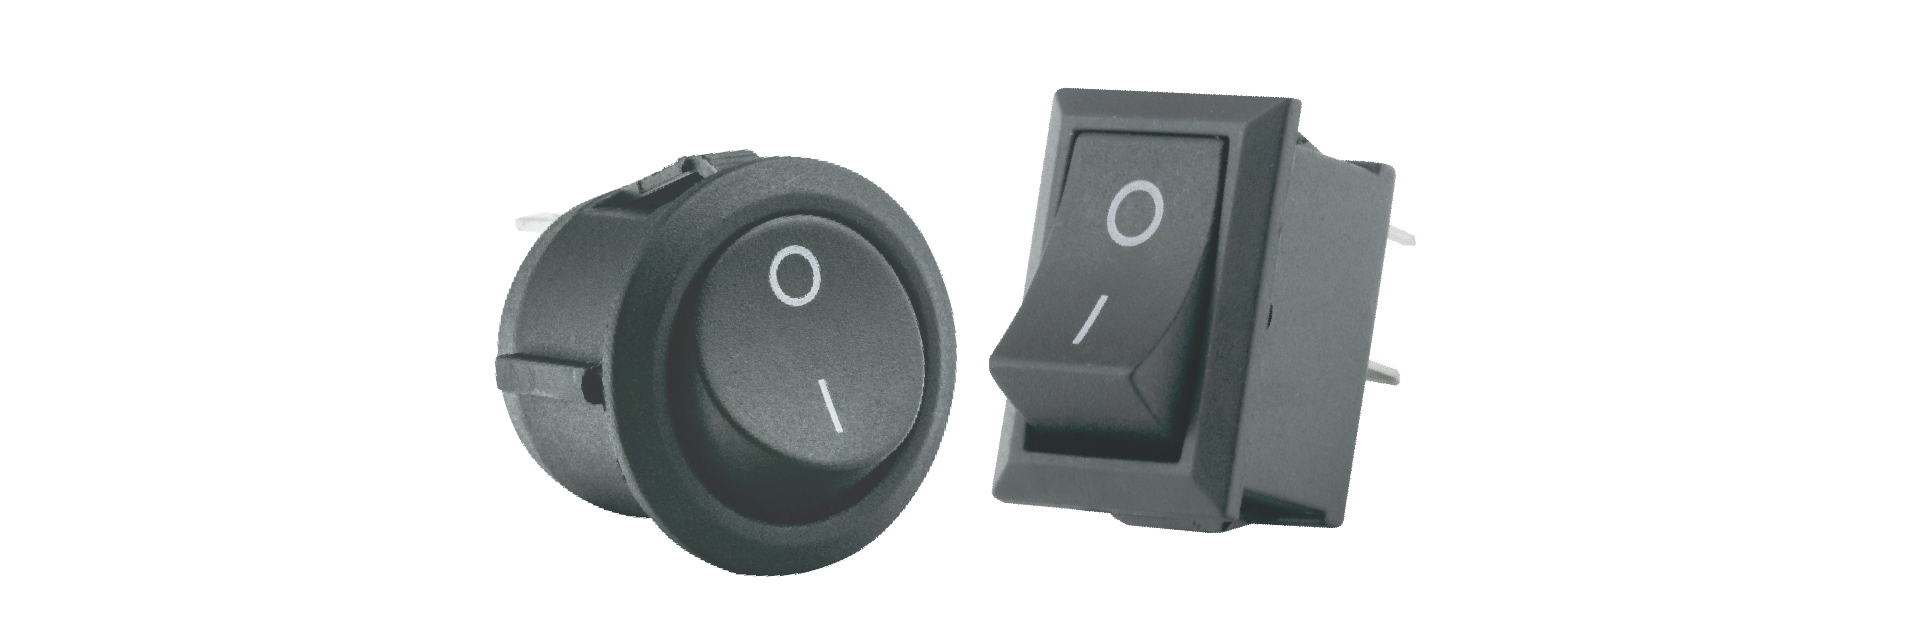 Botão Tic Tac SVART